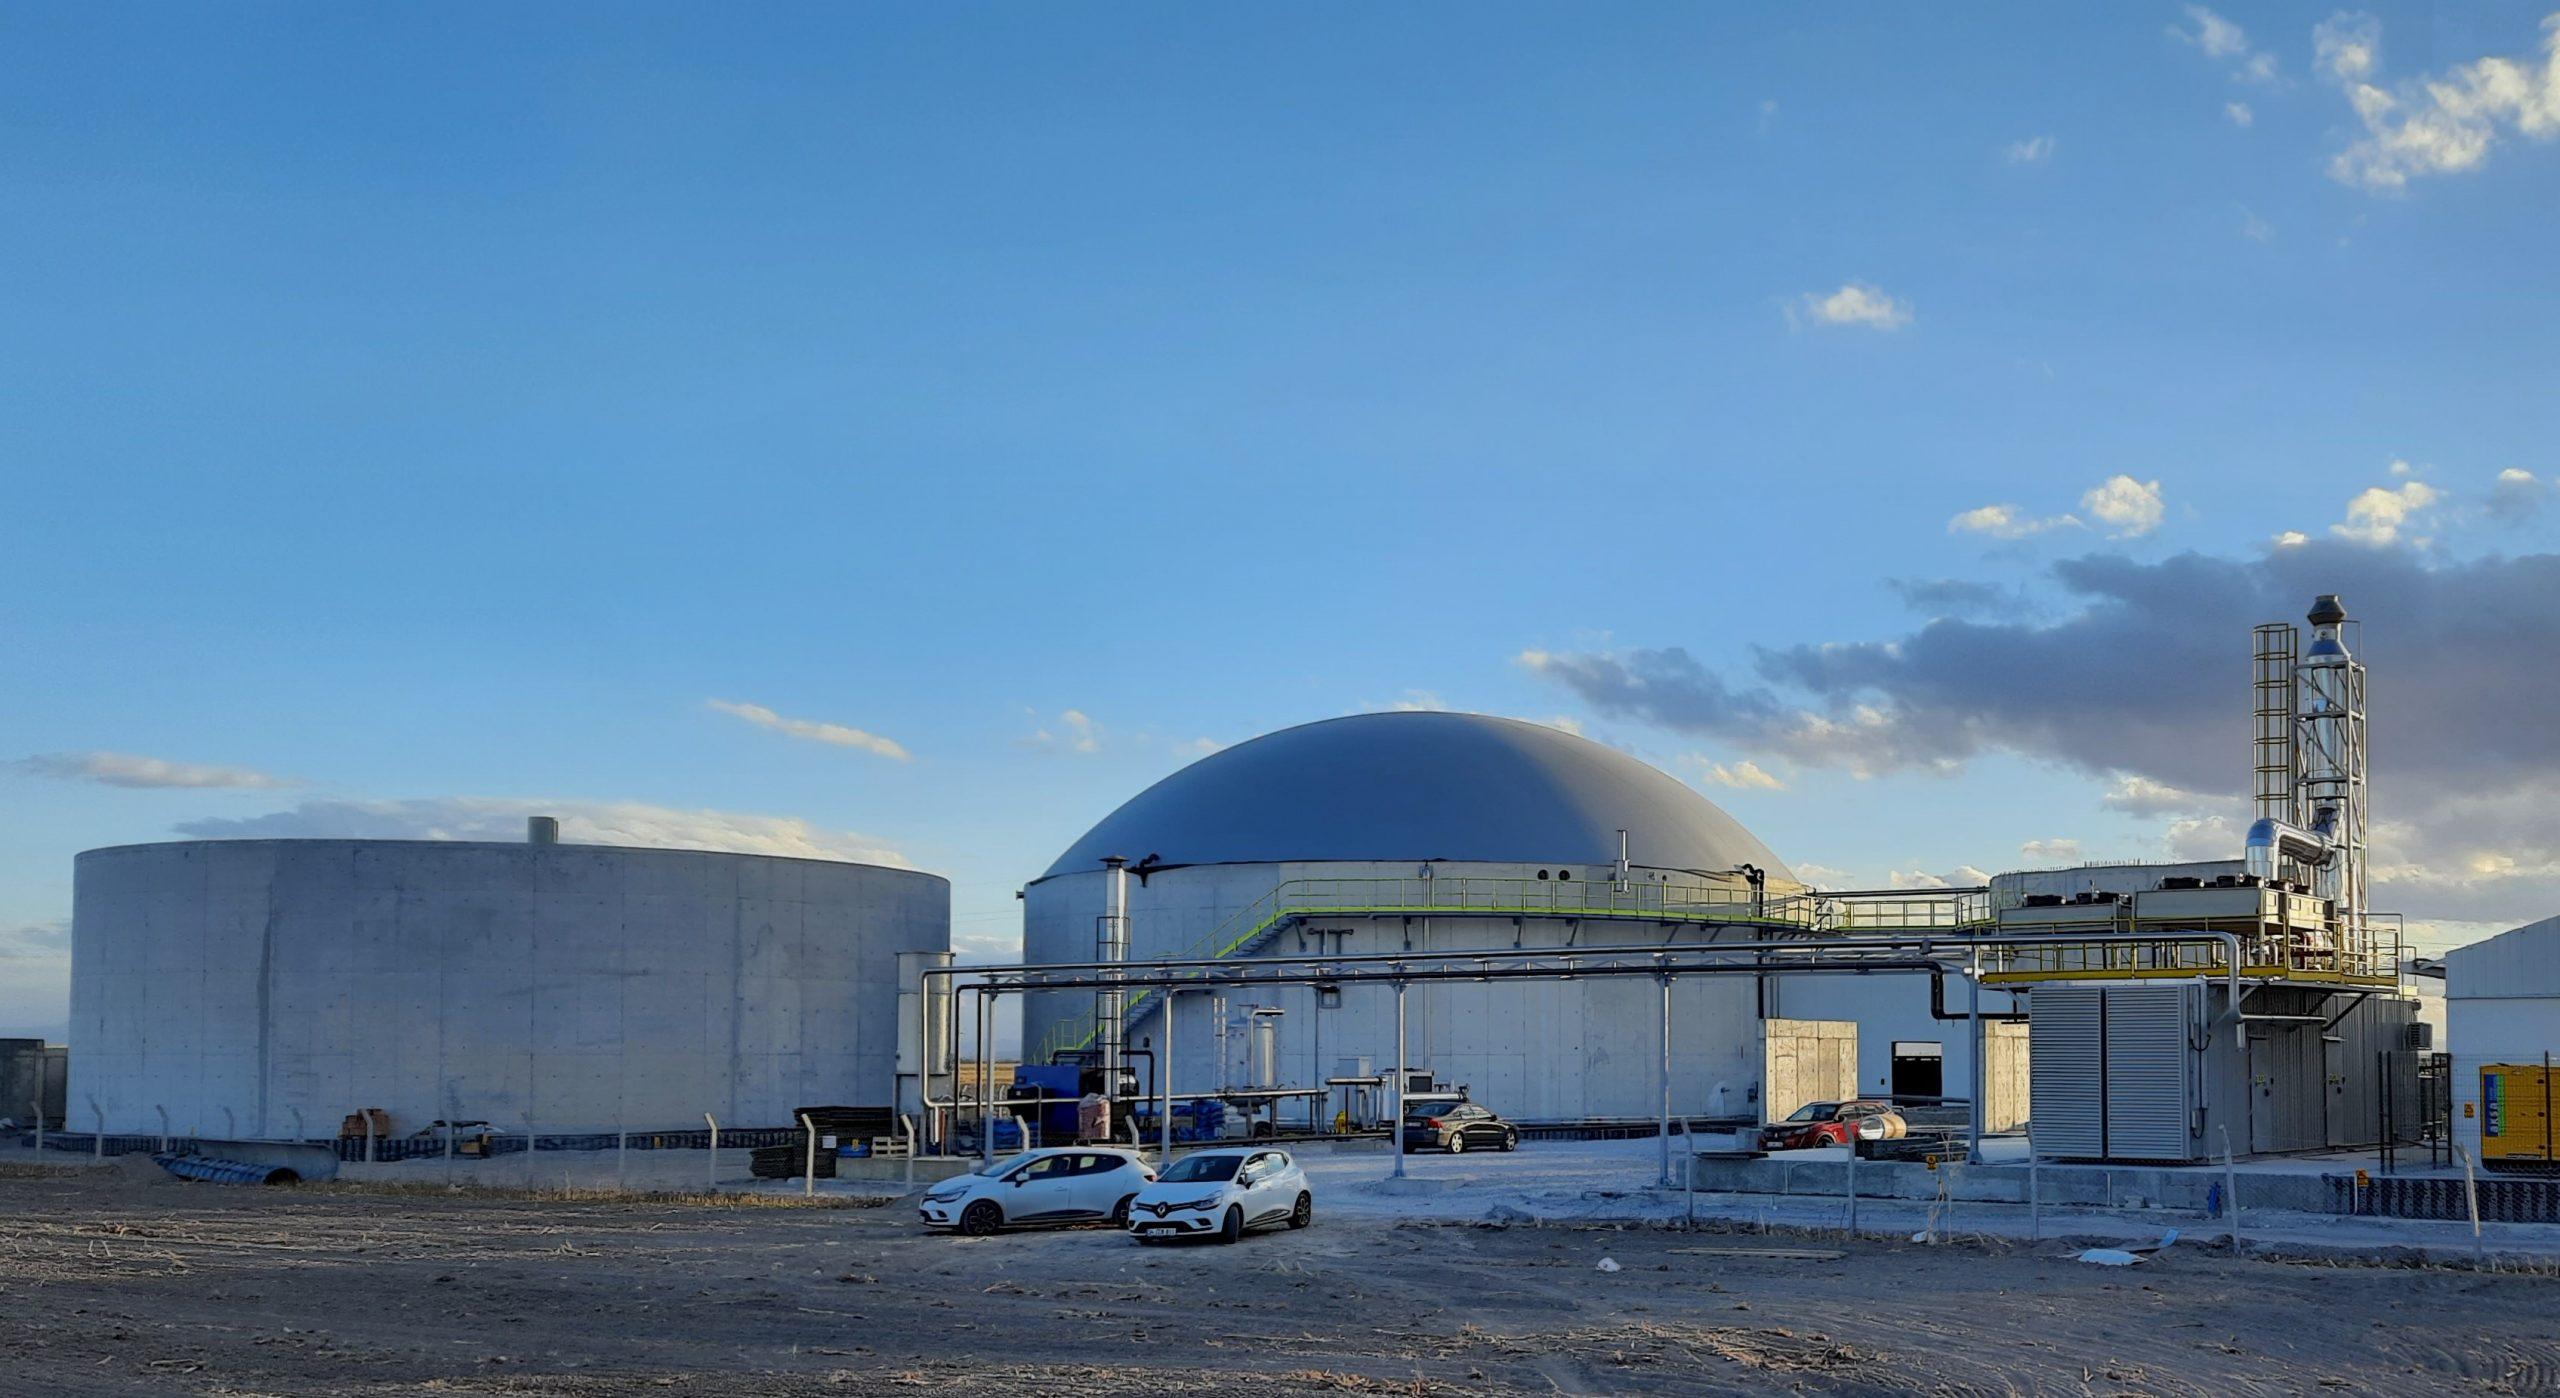 Beyaz Piramit Biyogaz Enerji santrali Faz1